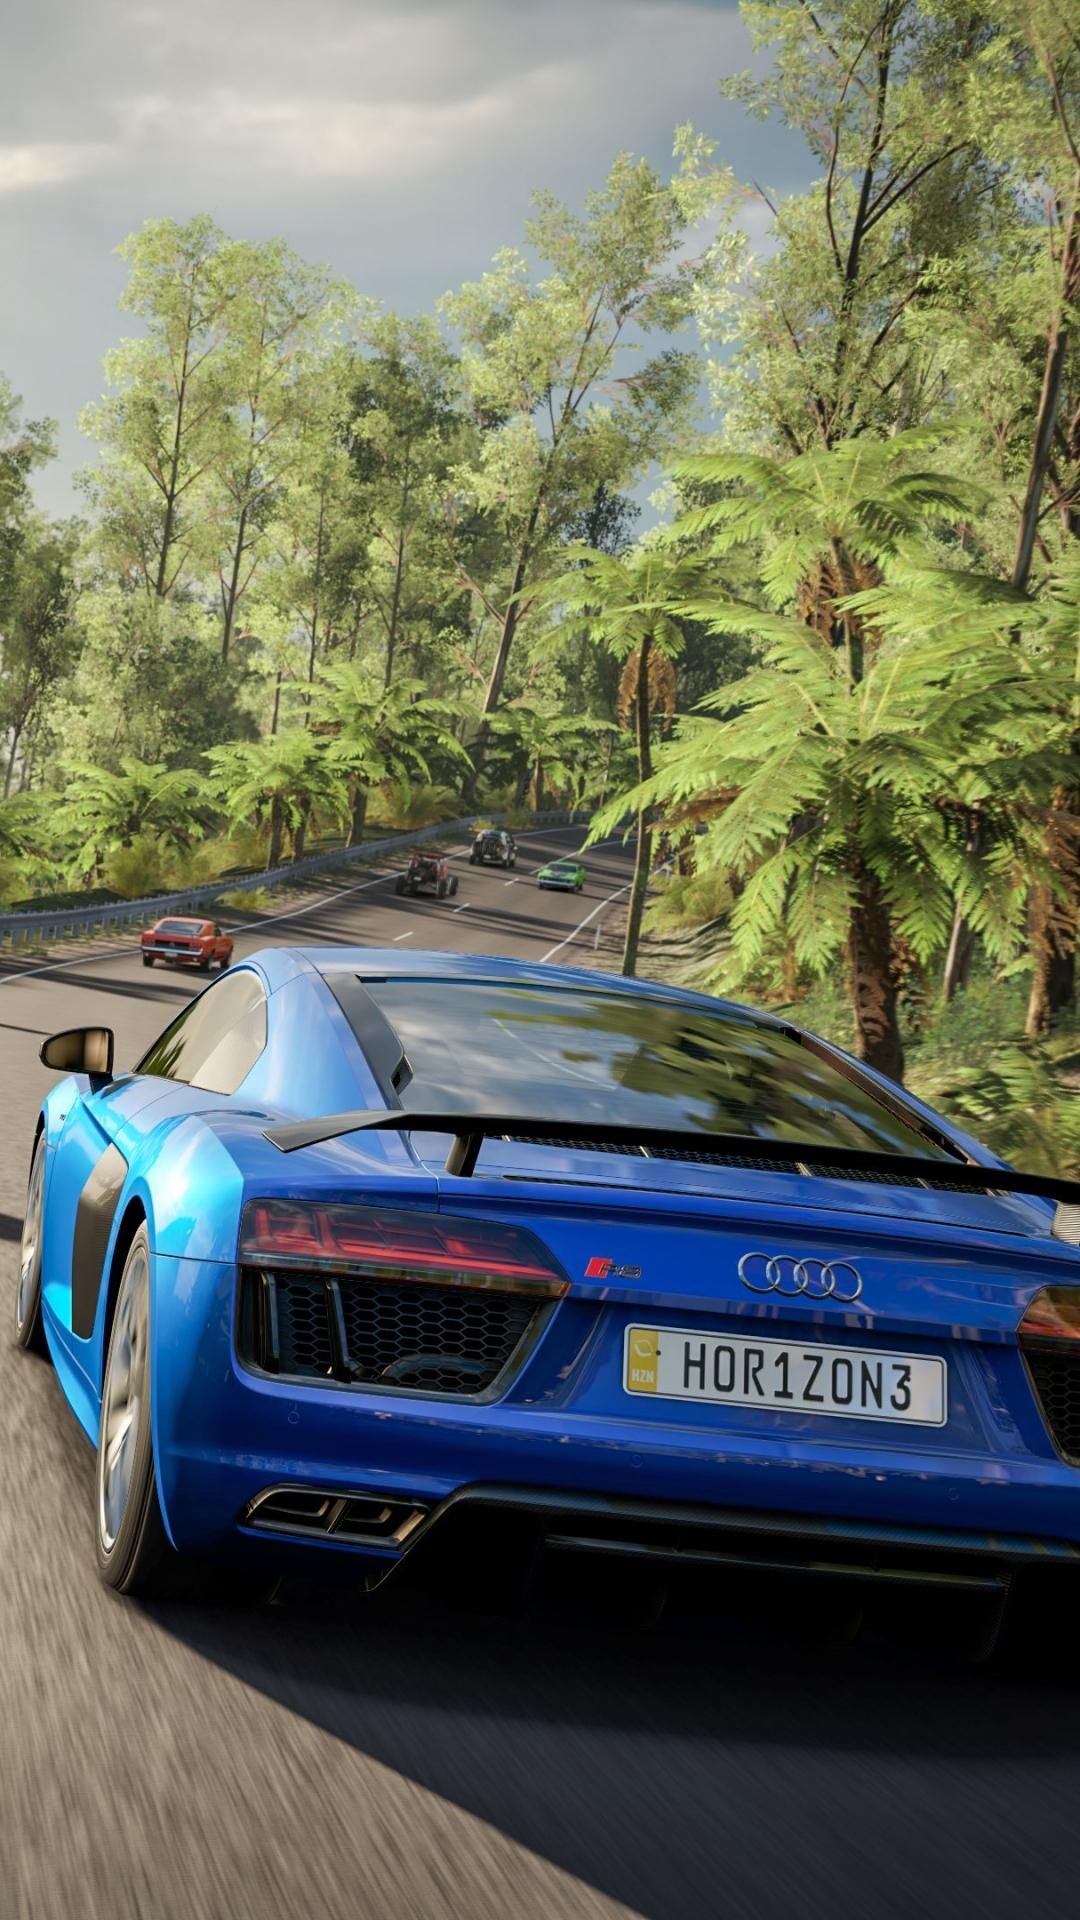 Video Game Forza Horizon 3 1080x1920 Wallpaper ID 688167